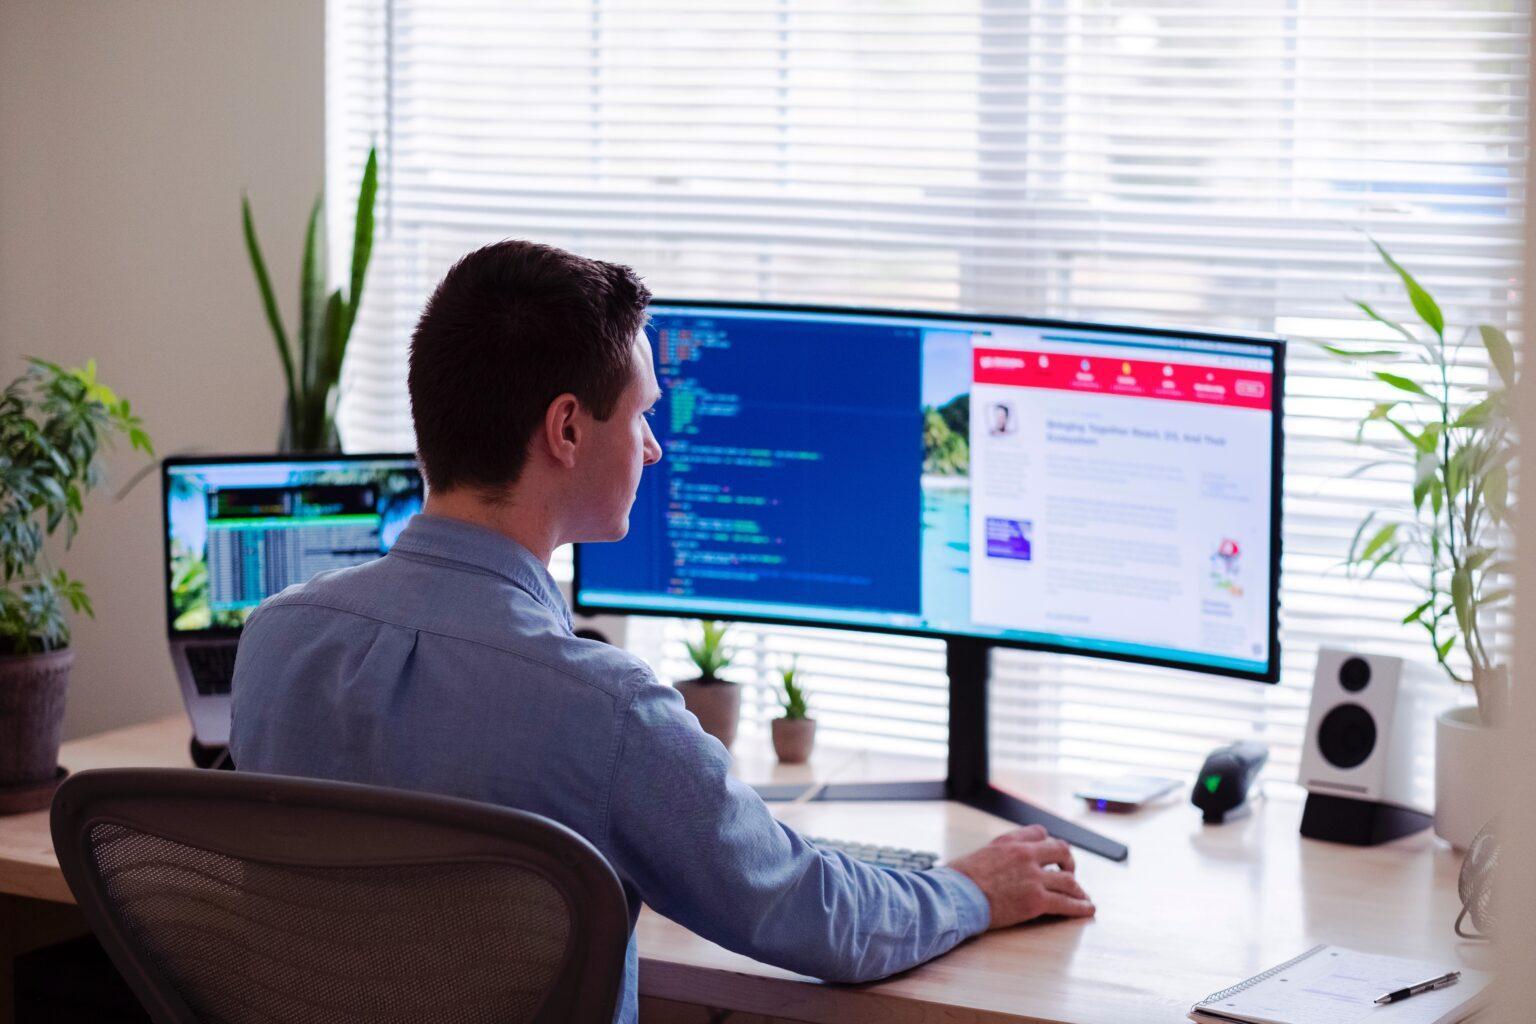 Homeoffice desktop setup